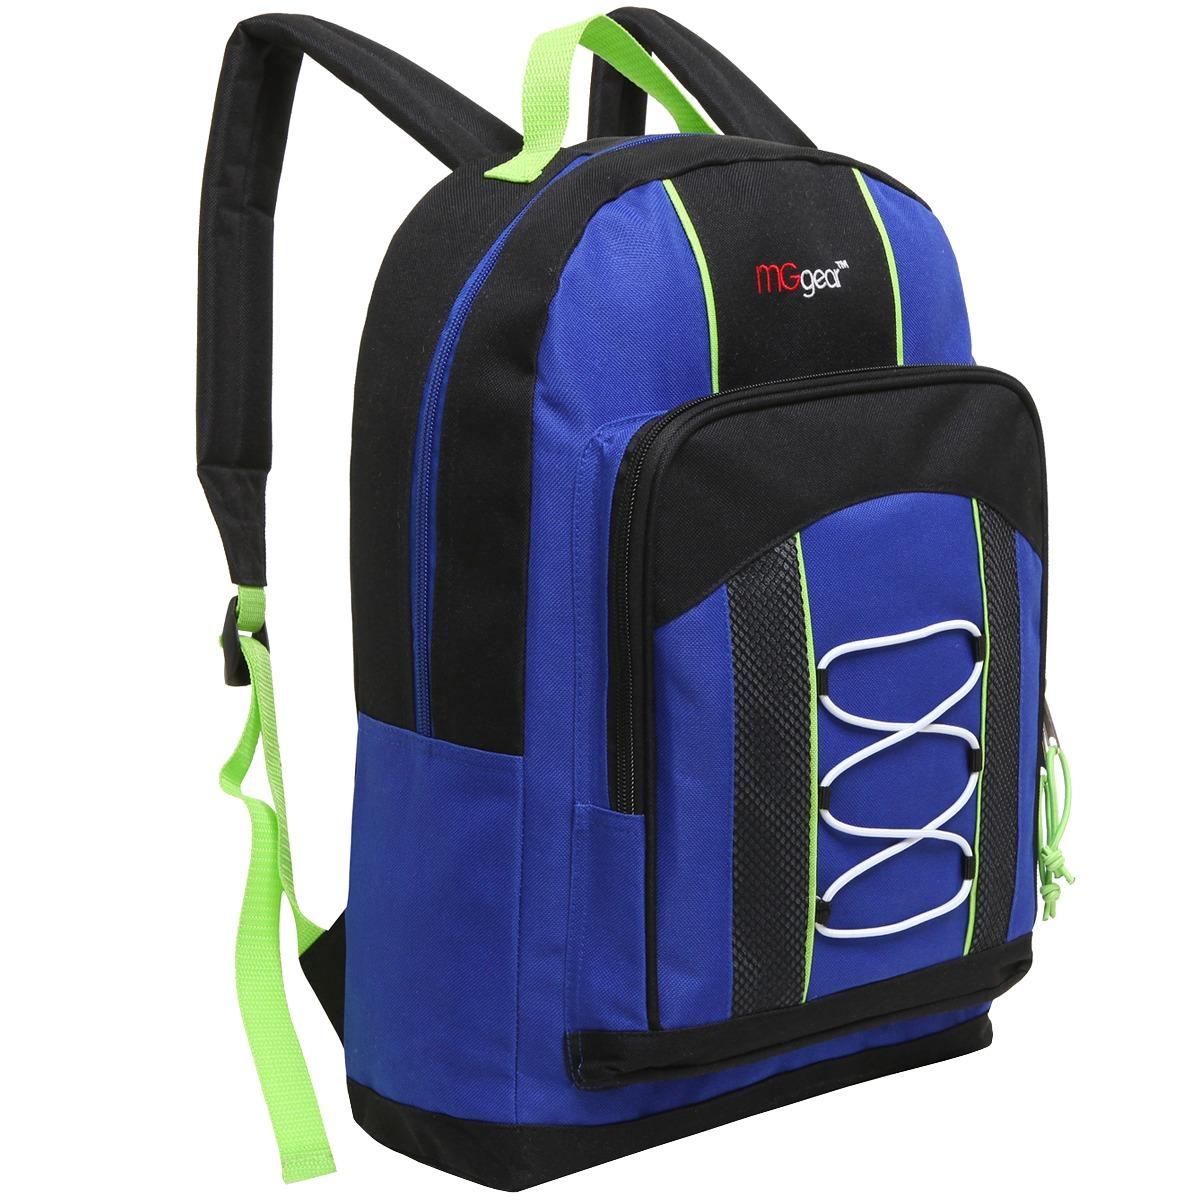 MGgear 15.5 Inch Bungee Pocket Elementary School Backpack For Kids, Blue